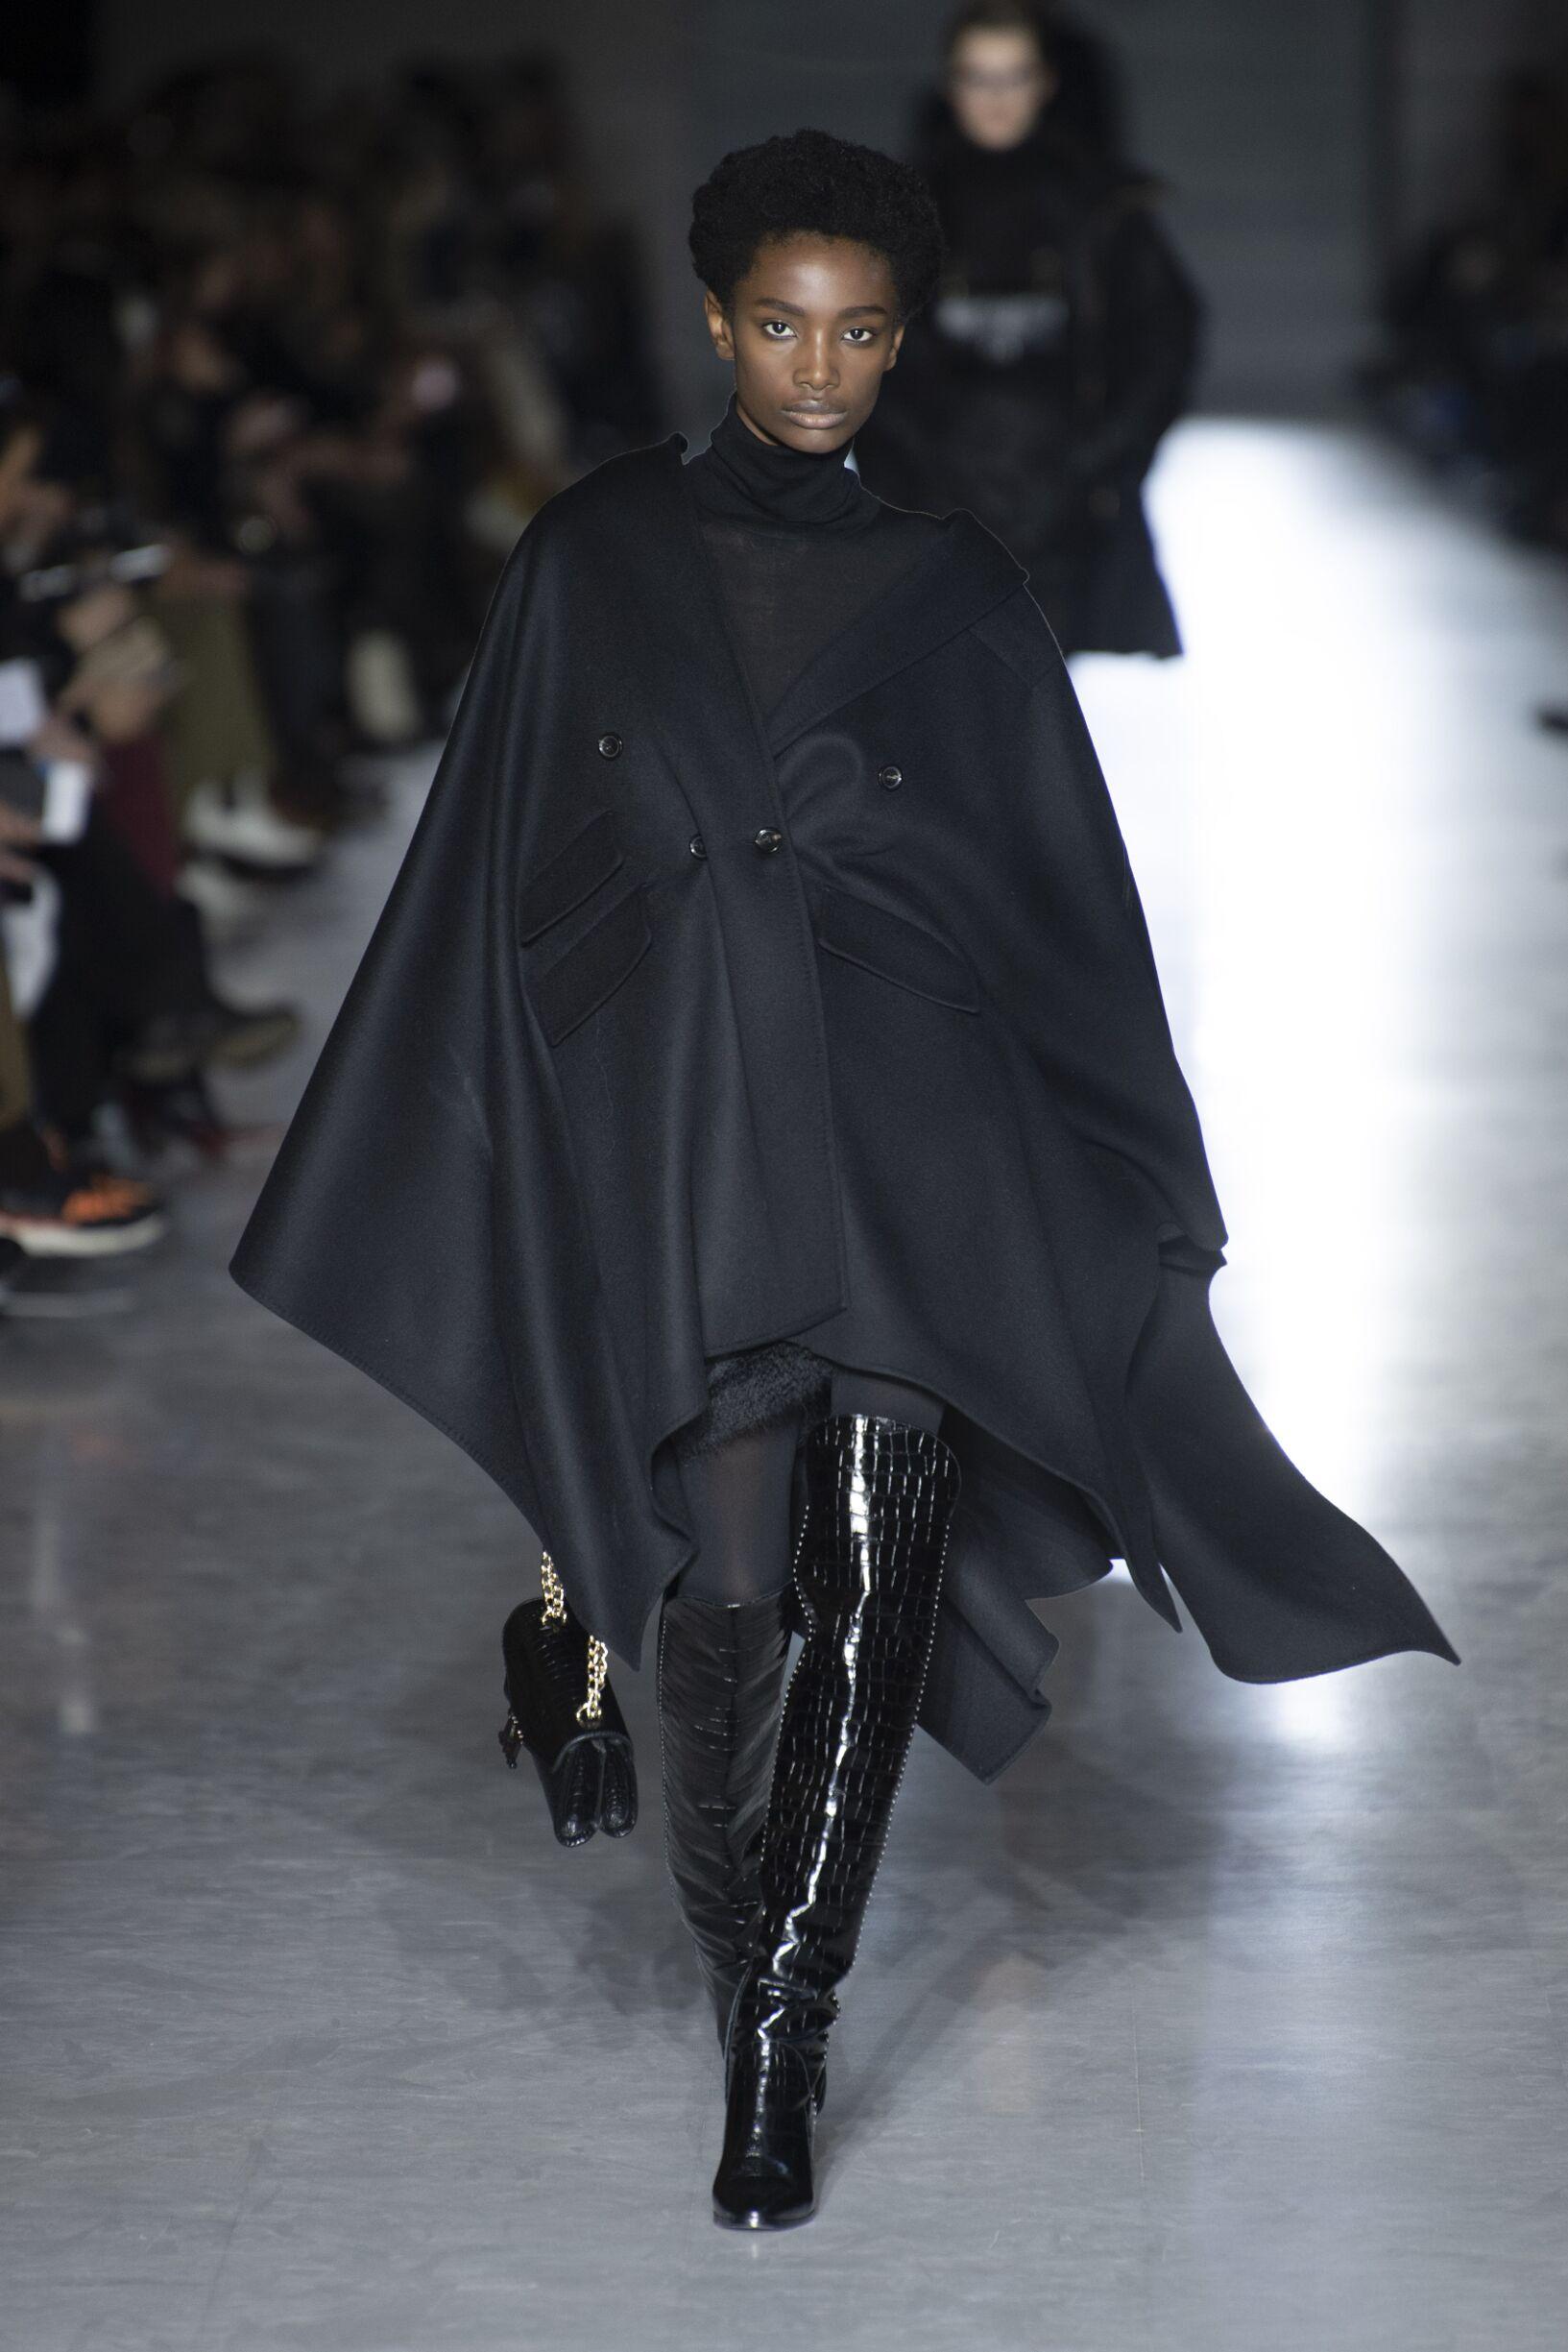 Woman FW 2019 Max Mara Show Milan Fashion Week